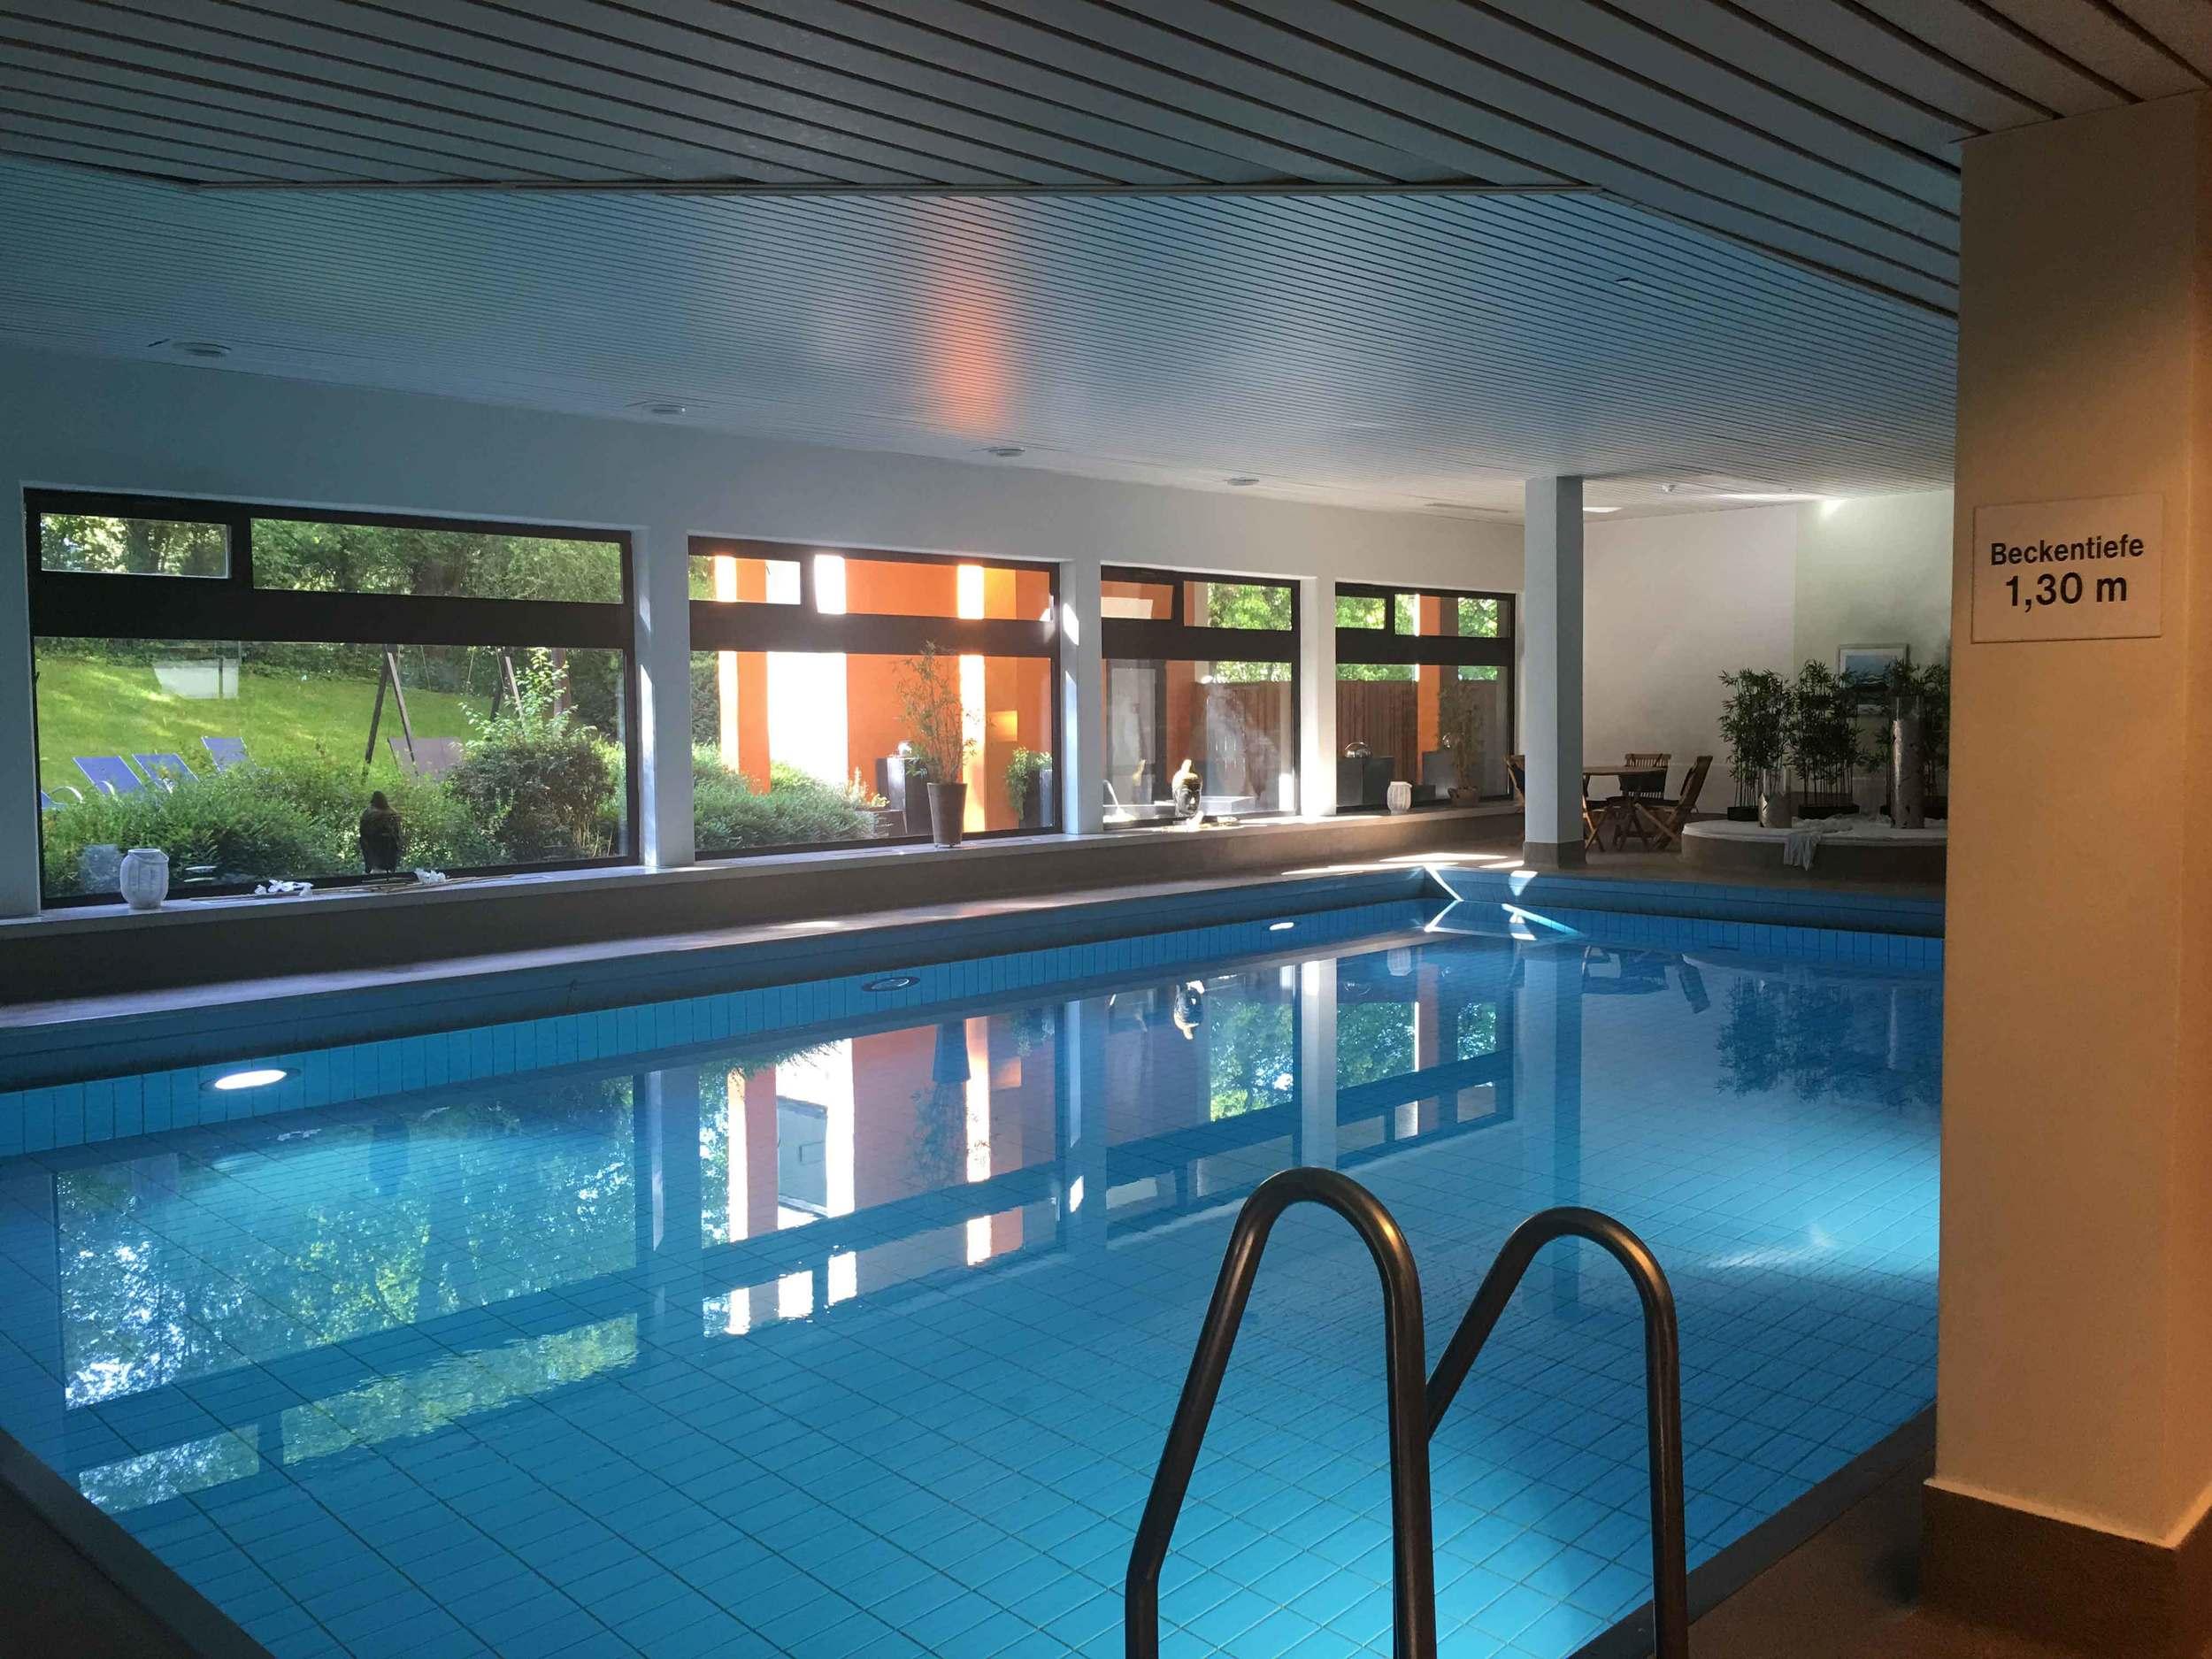 Swimming pool, Leonardo Royal hotel, Baden Baden, Germany. Image©sourcingstyle.com